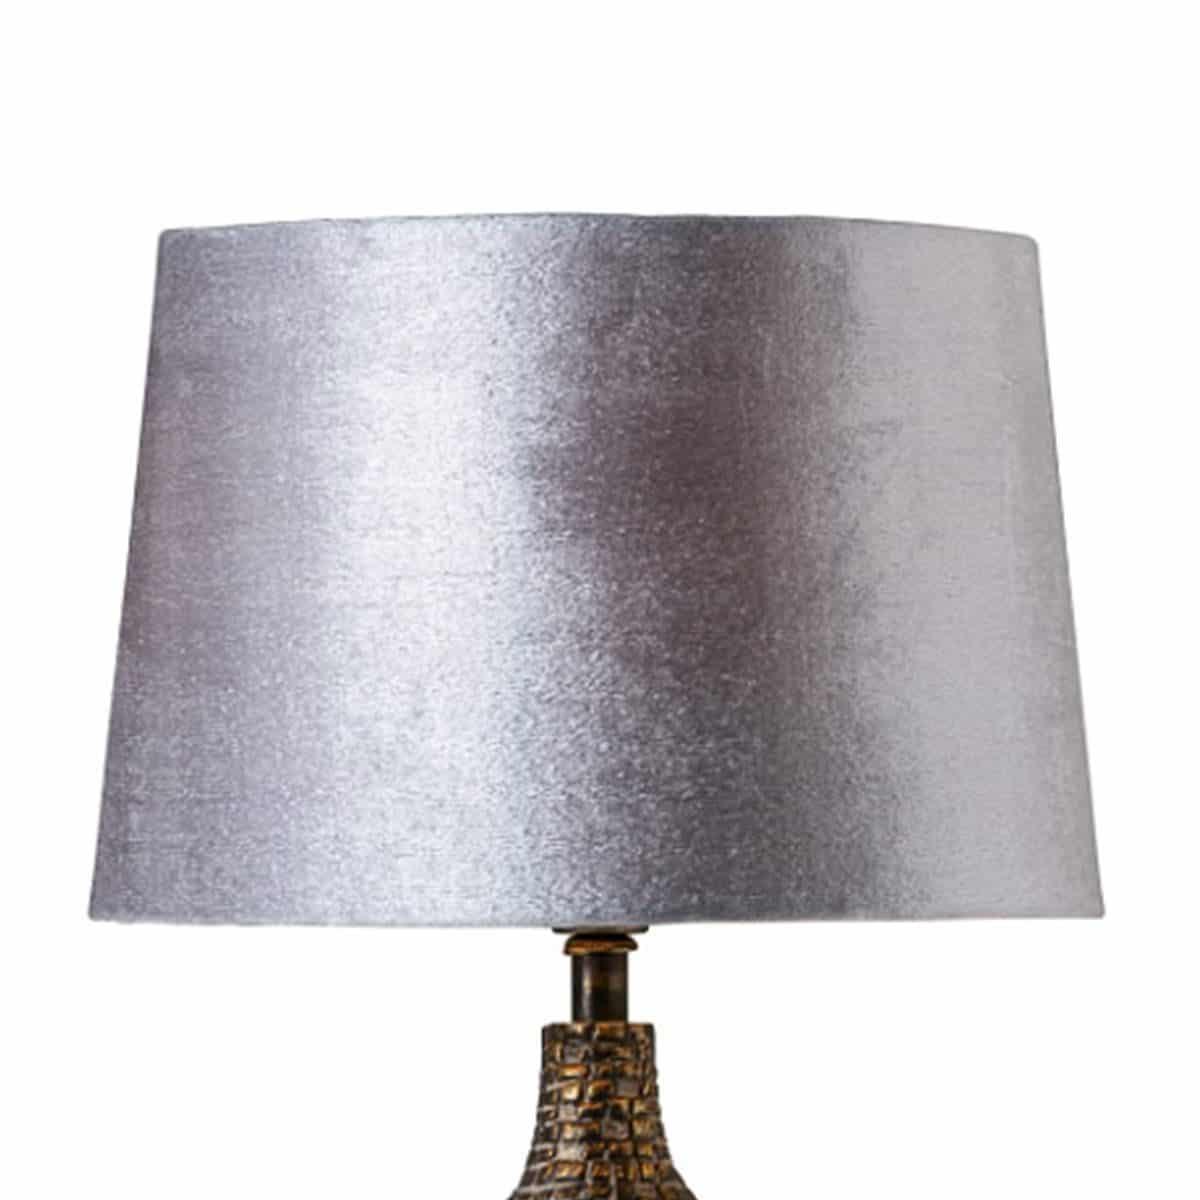 Watt & Veke lampskärm Lola silver 33